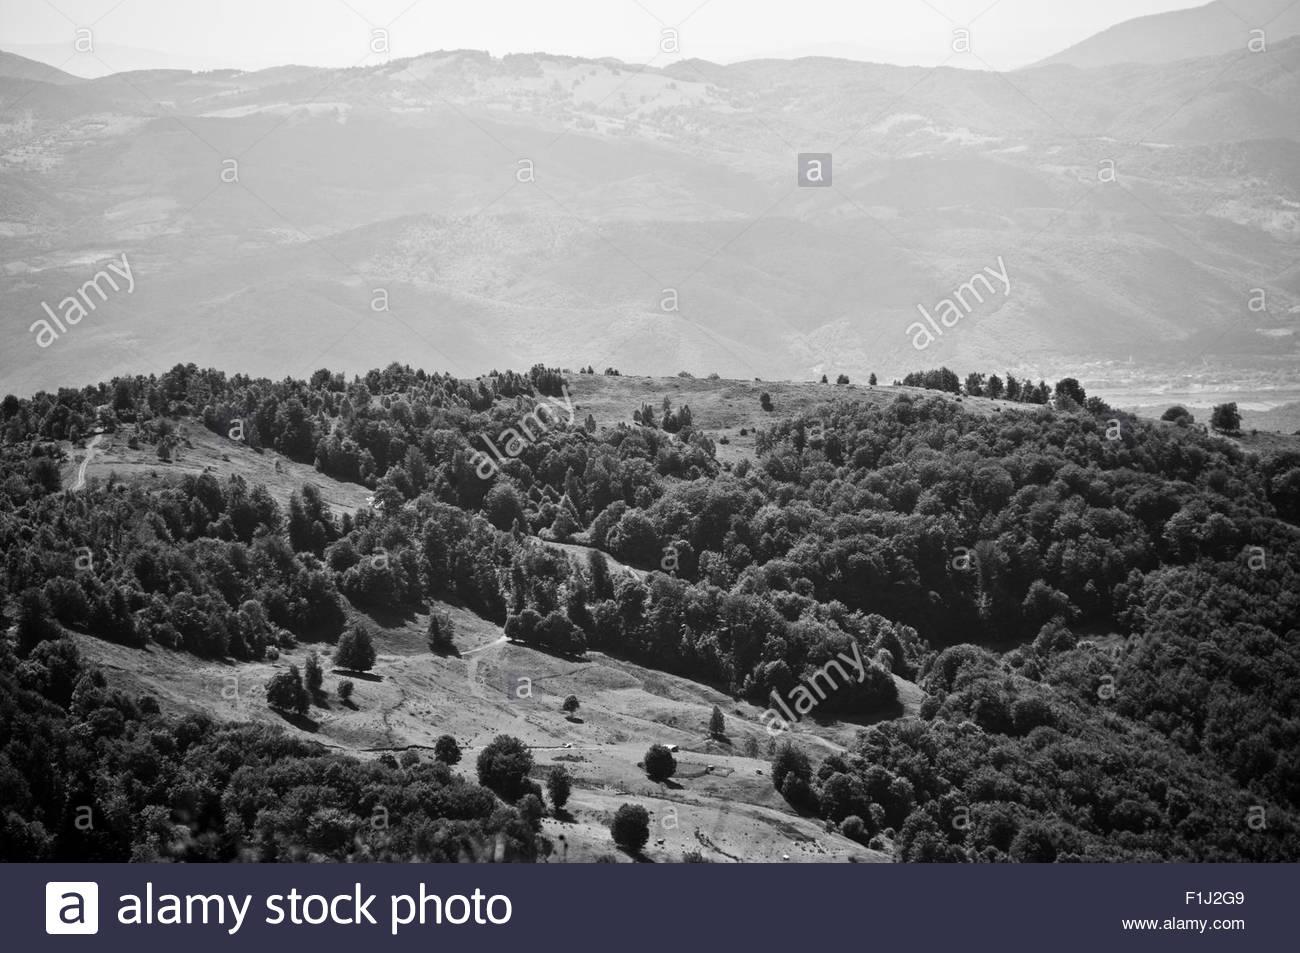 A small glade on Biharia mountain. - Stock Image